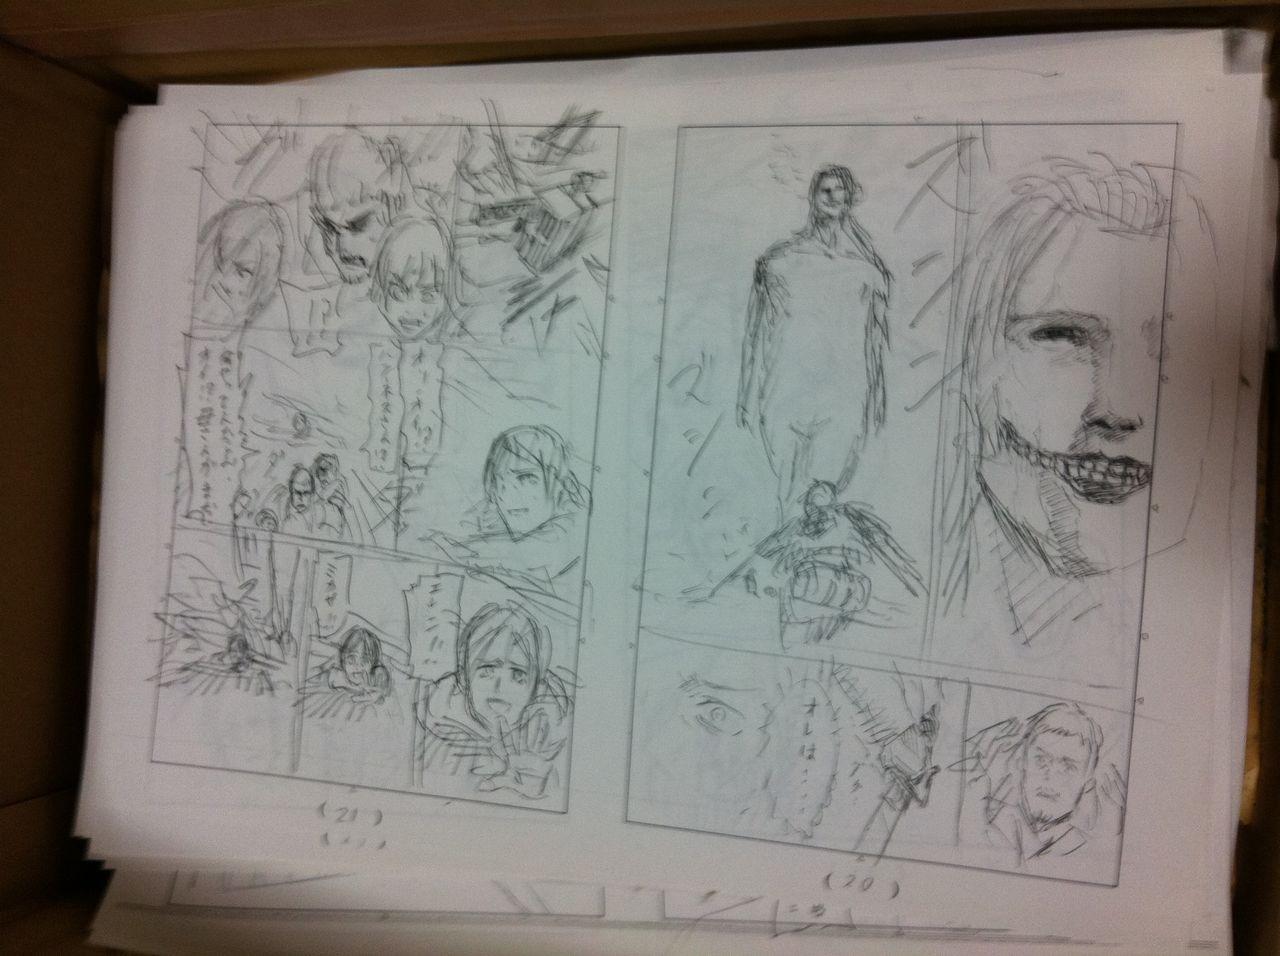 http://blog-imgs-61.fc2.com/k/y/a/kyarasokuhou/YhlEMiW.jpg